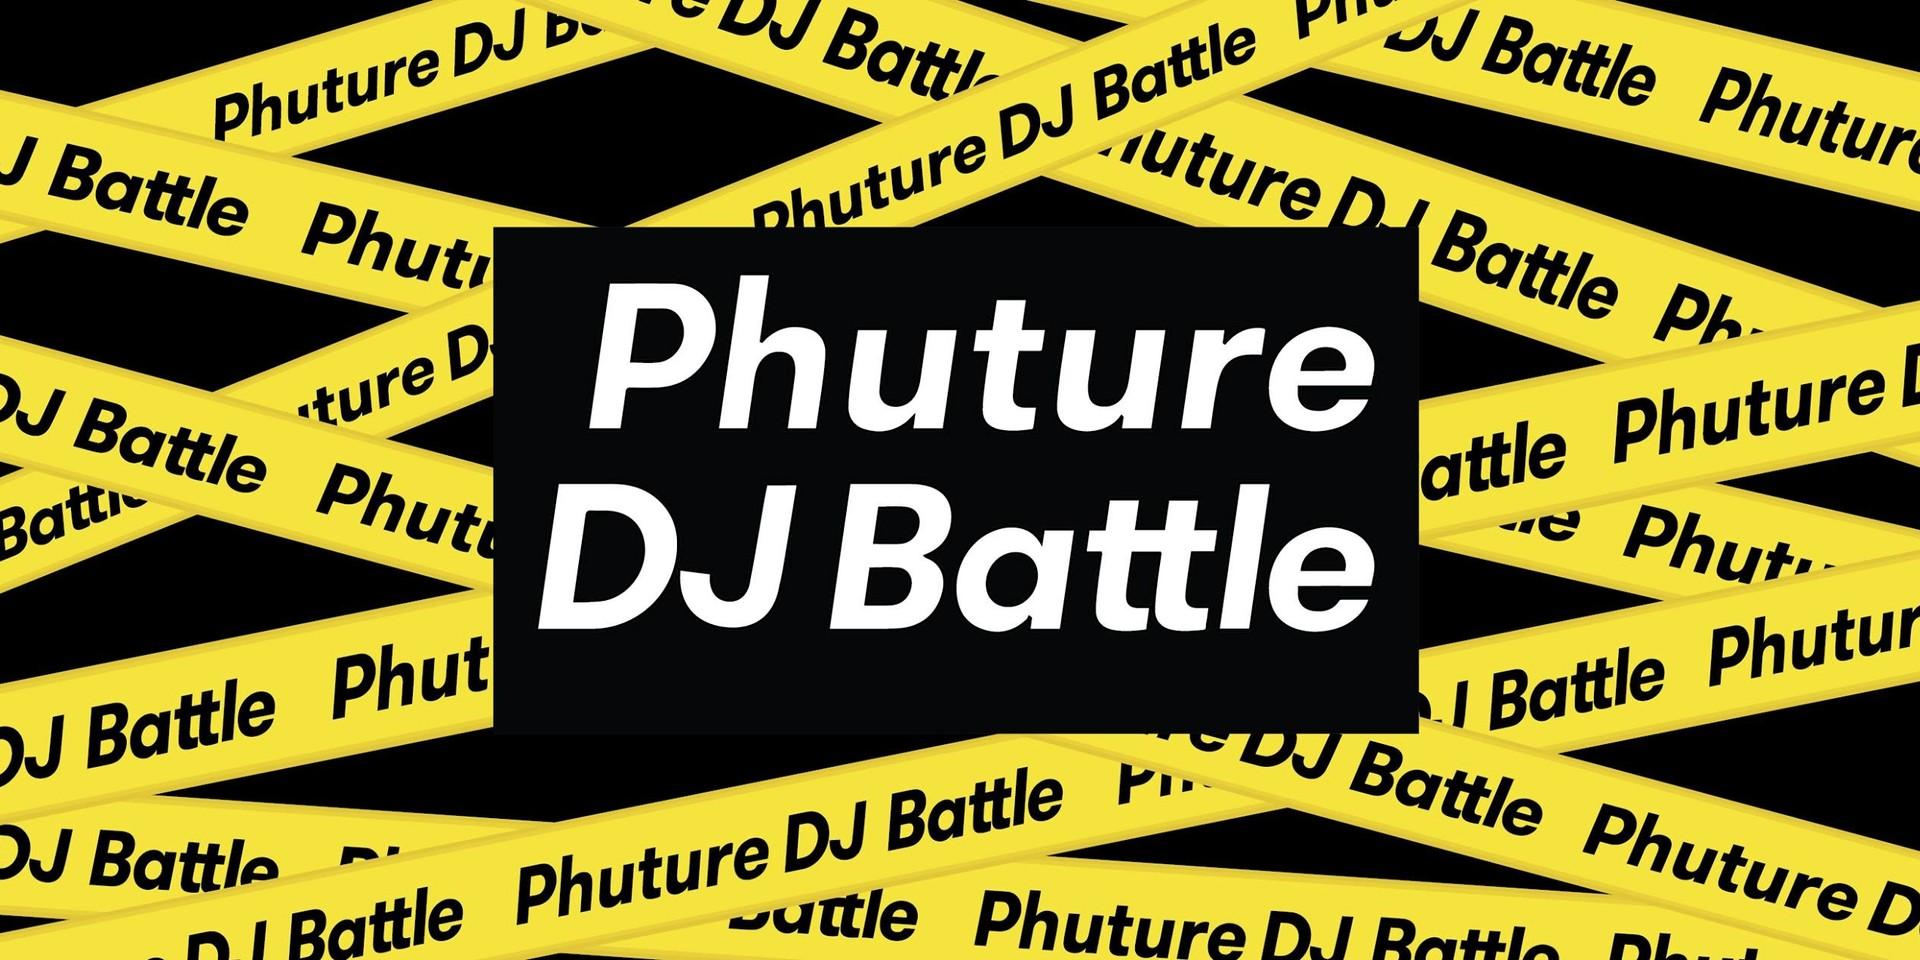 Finalists announced for Phuture DJ Battle 2017